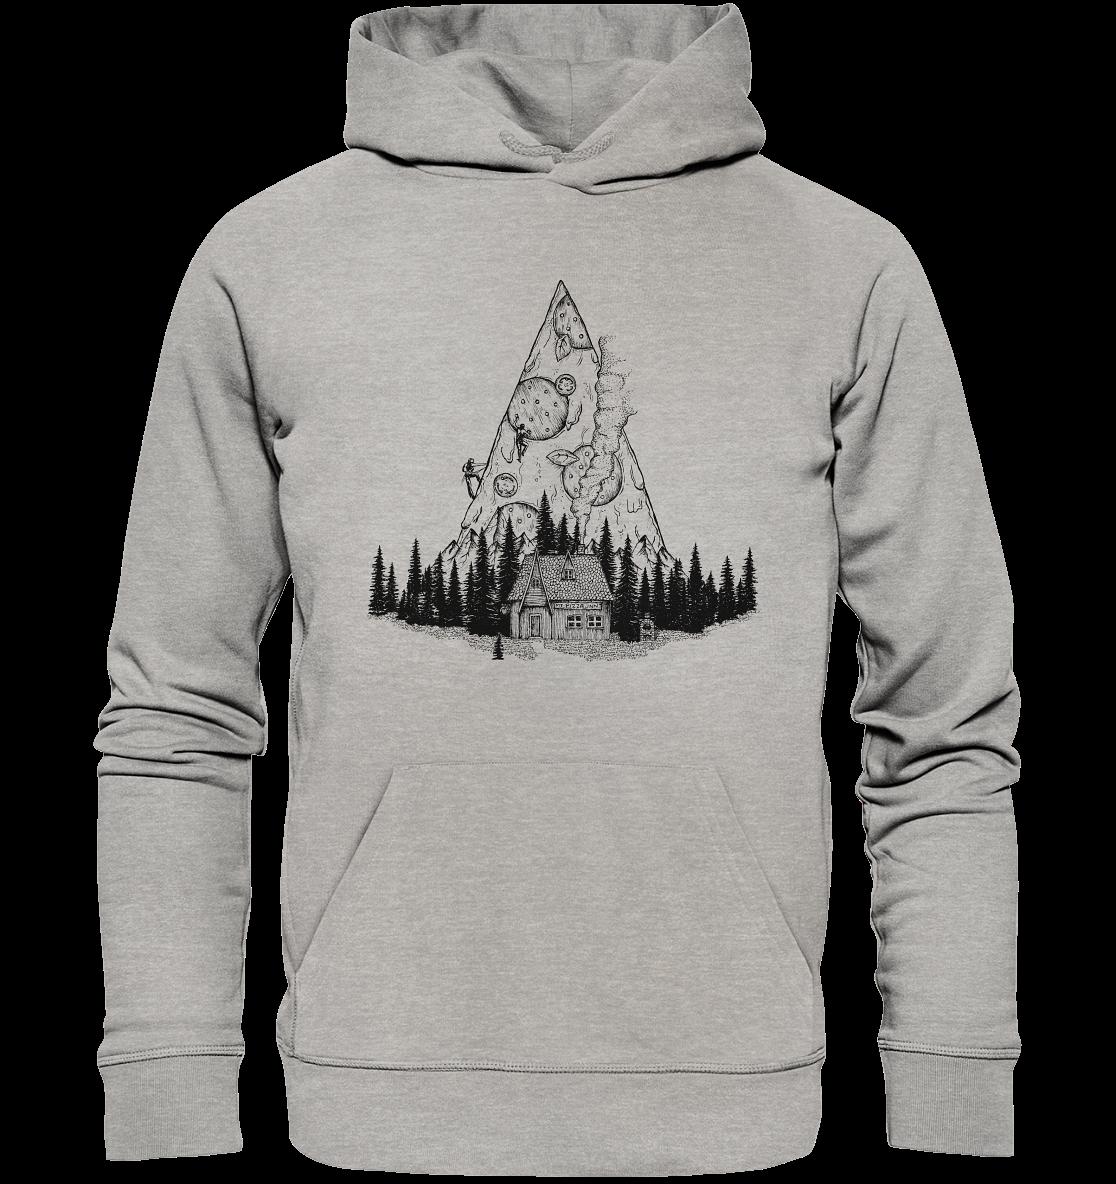 front-organic-hoodie-c2c1c0-1116x-6.png